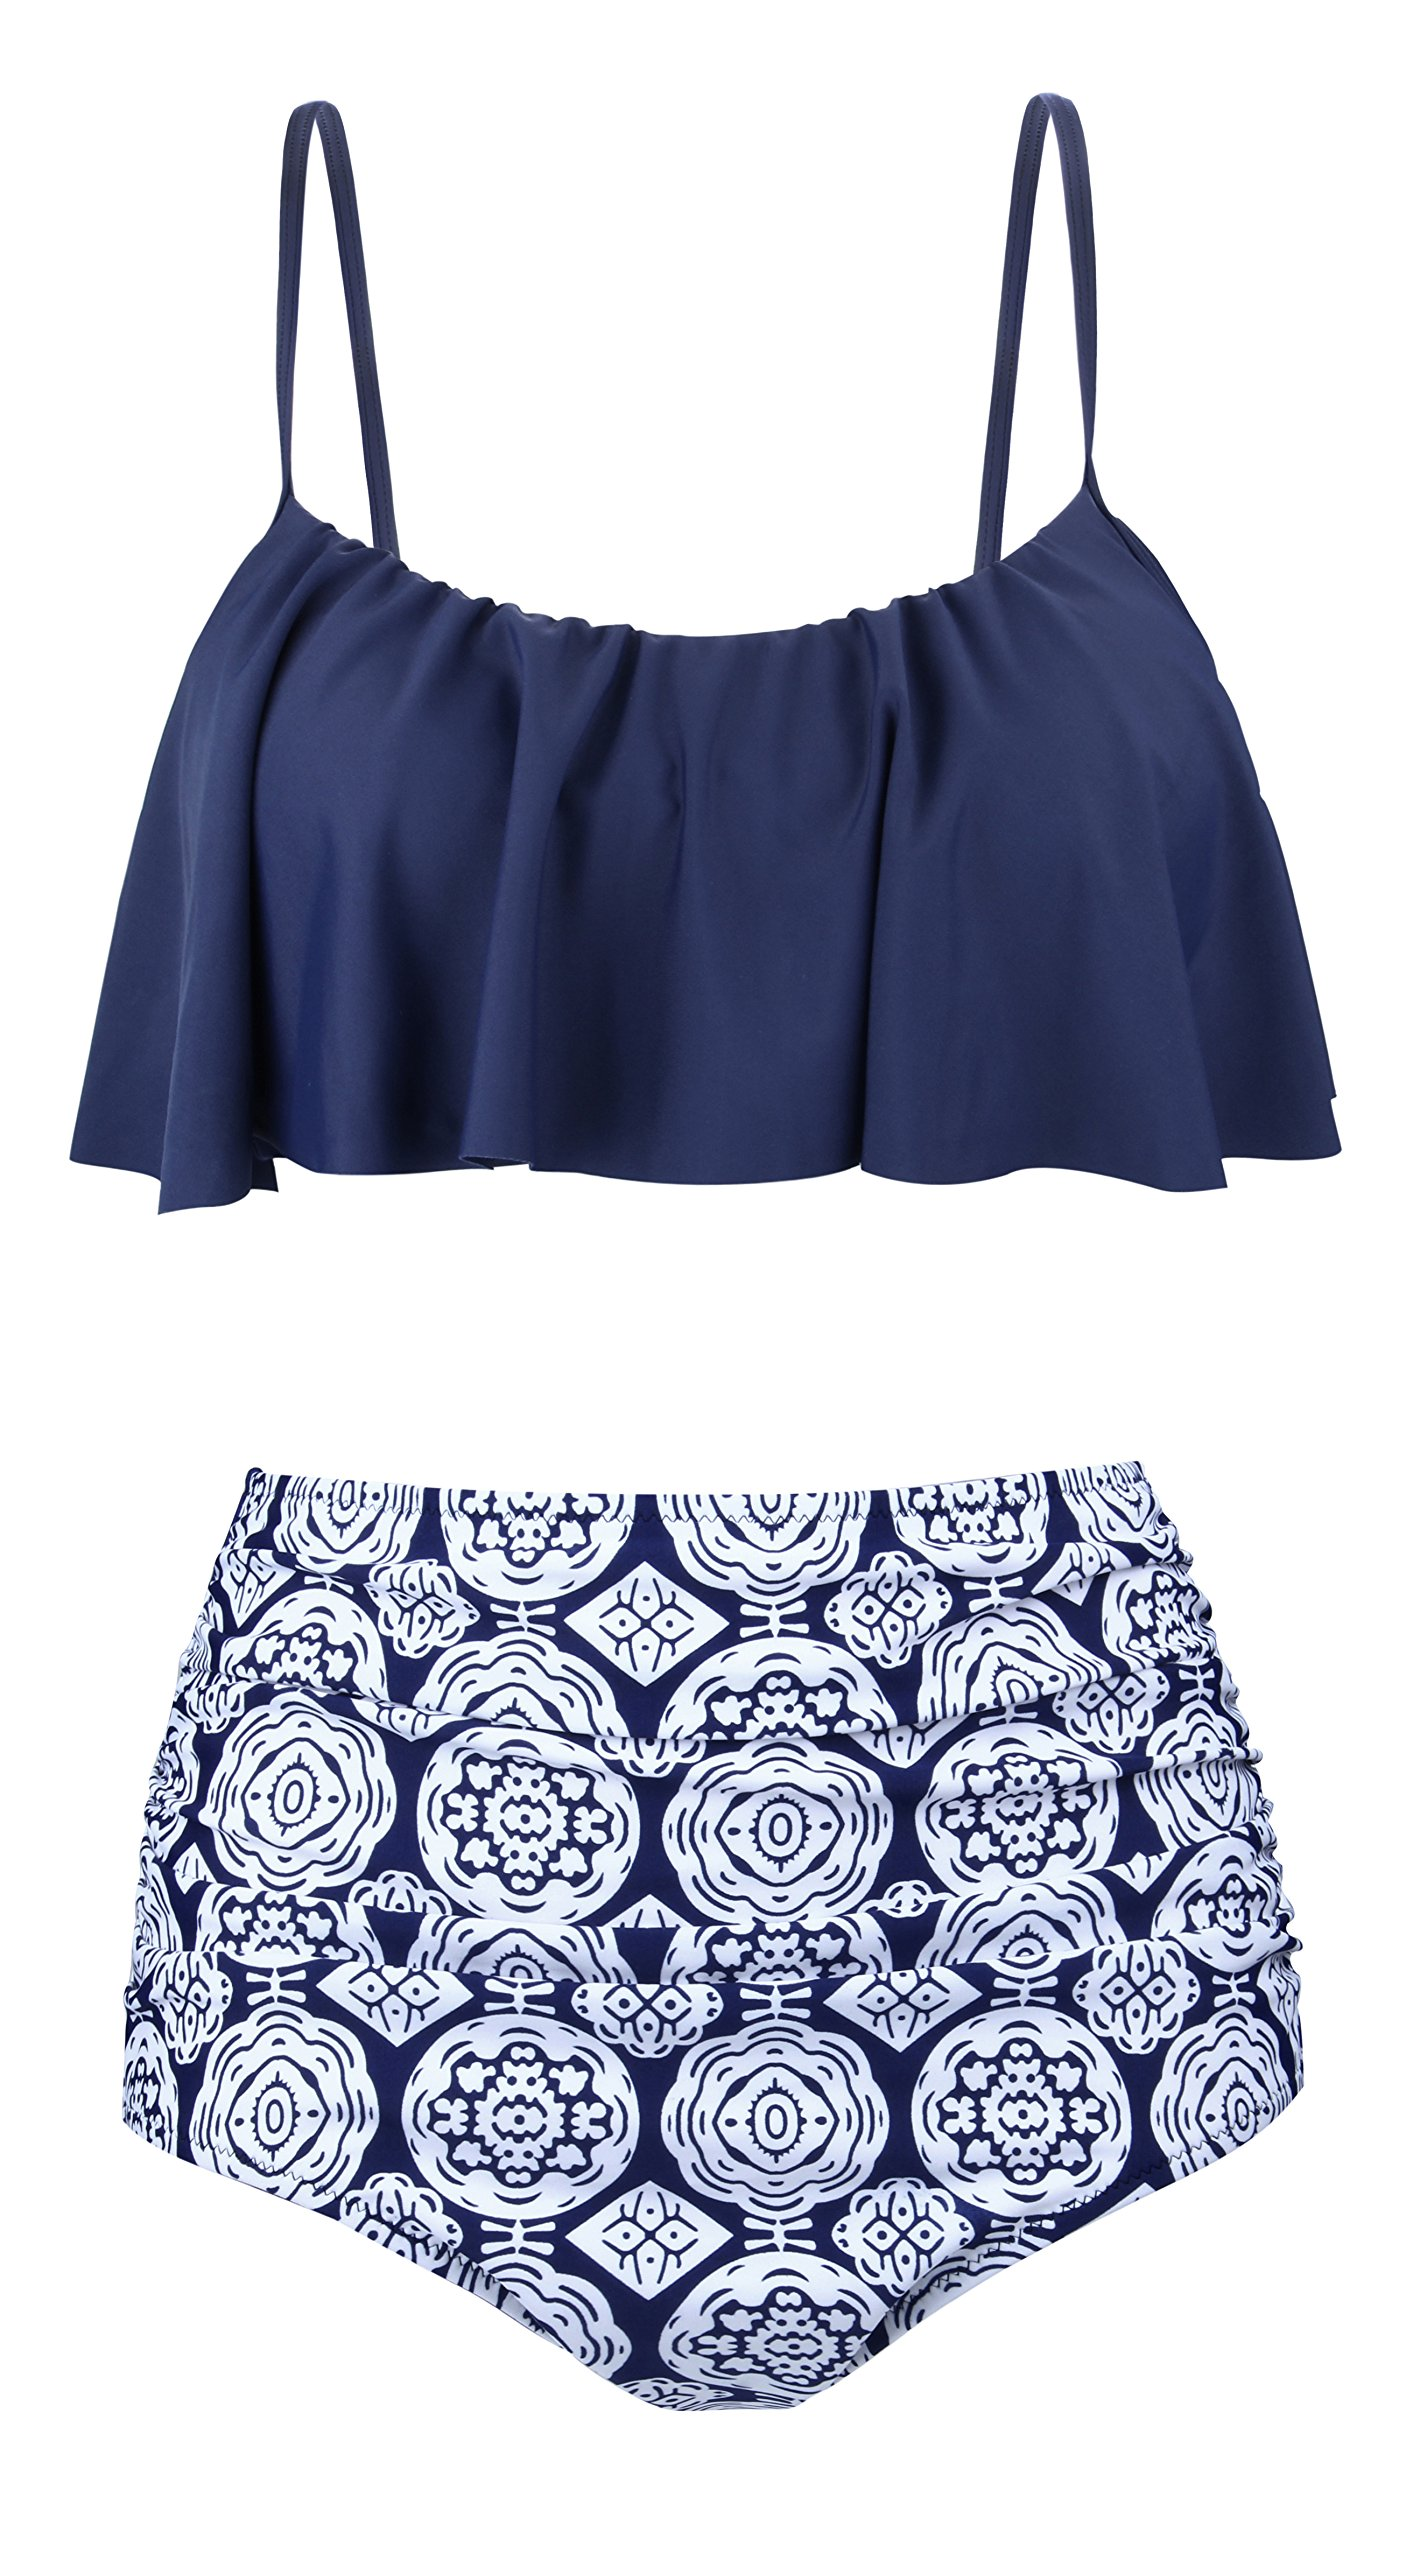 Angerella Swimsuits For Women Ruffled Top Swimwear High Waisted Bikini,Navy,US 4-6=Tag Size M